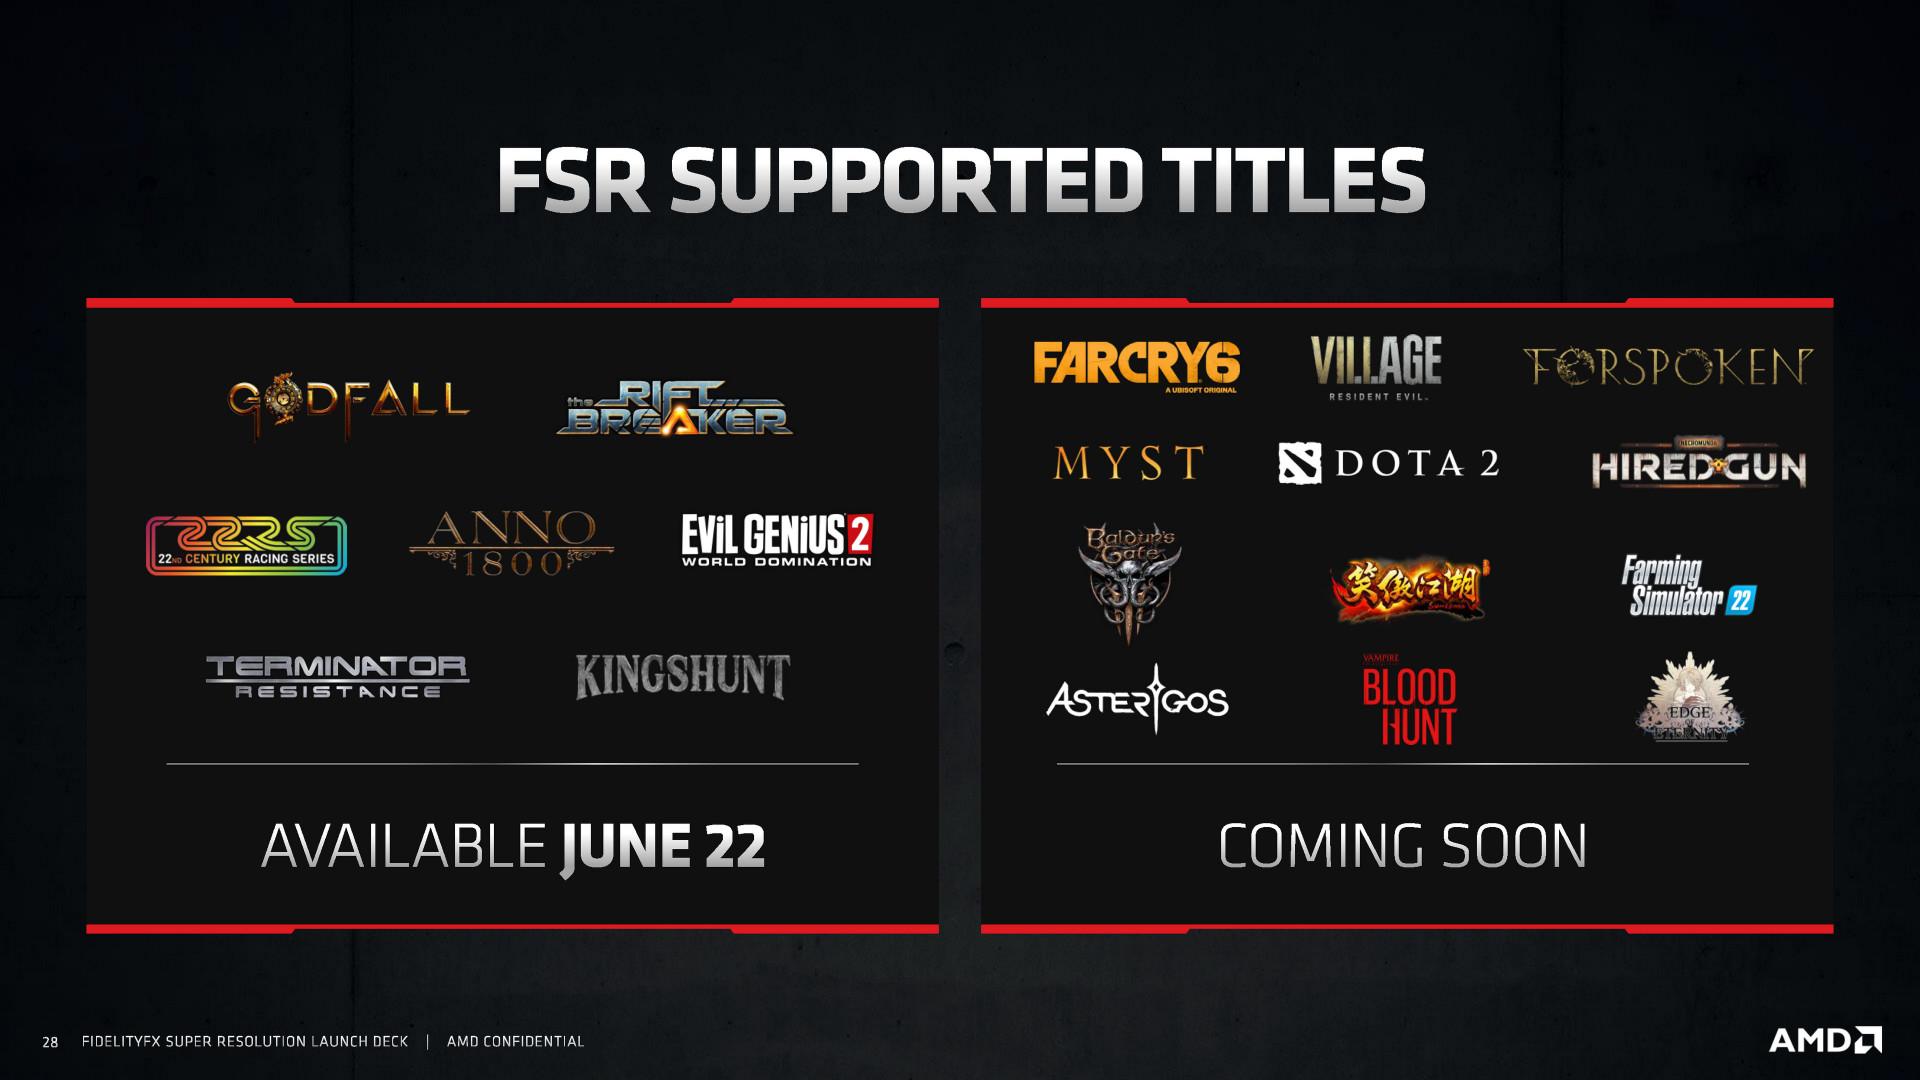 AMD FSR Launch Slides Page 28